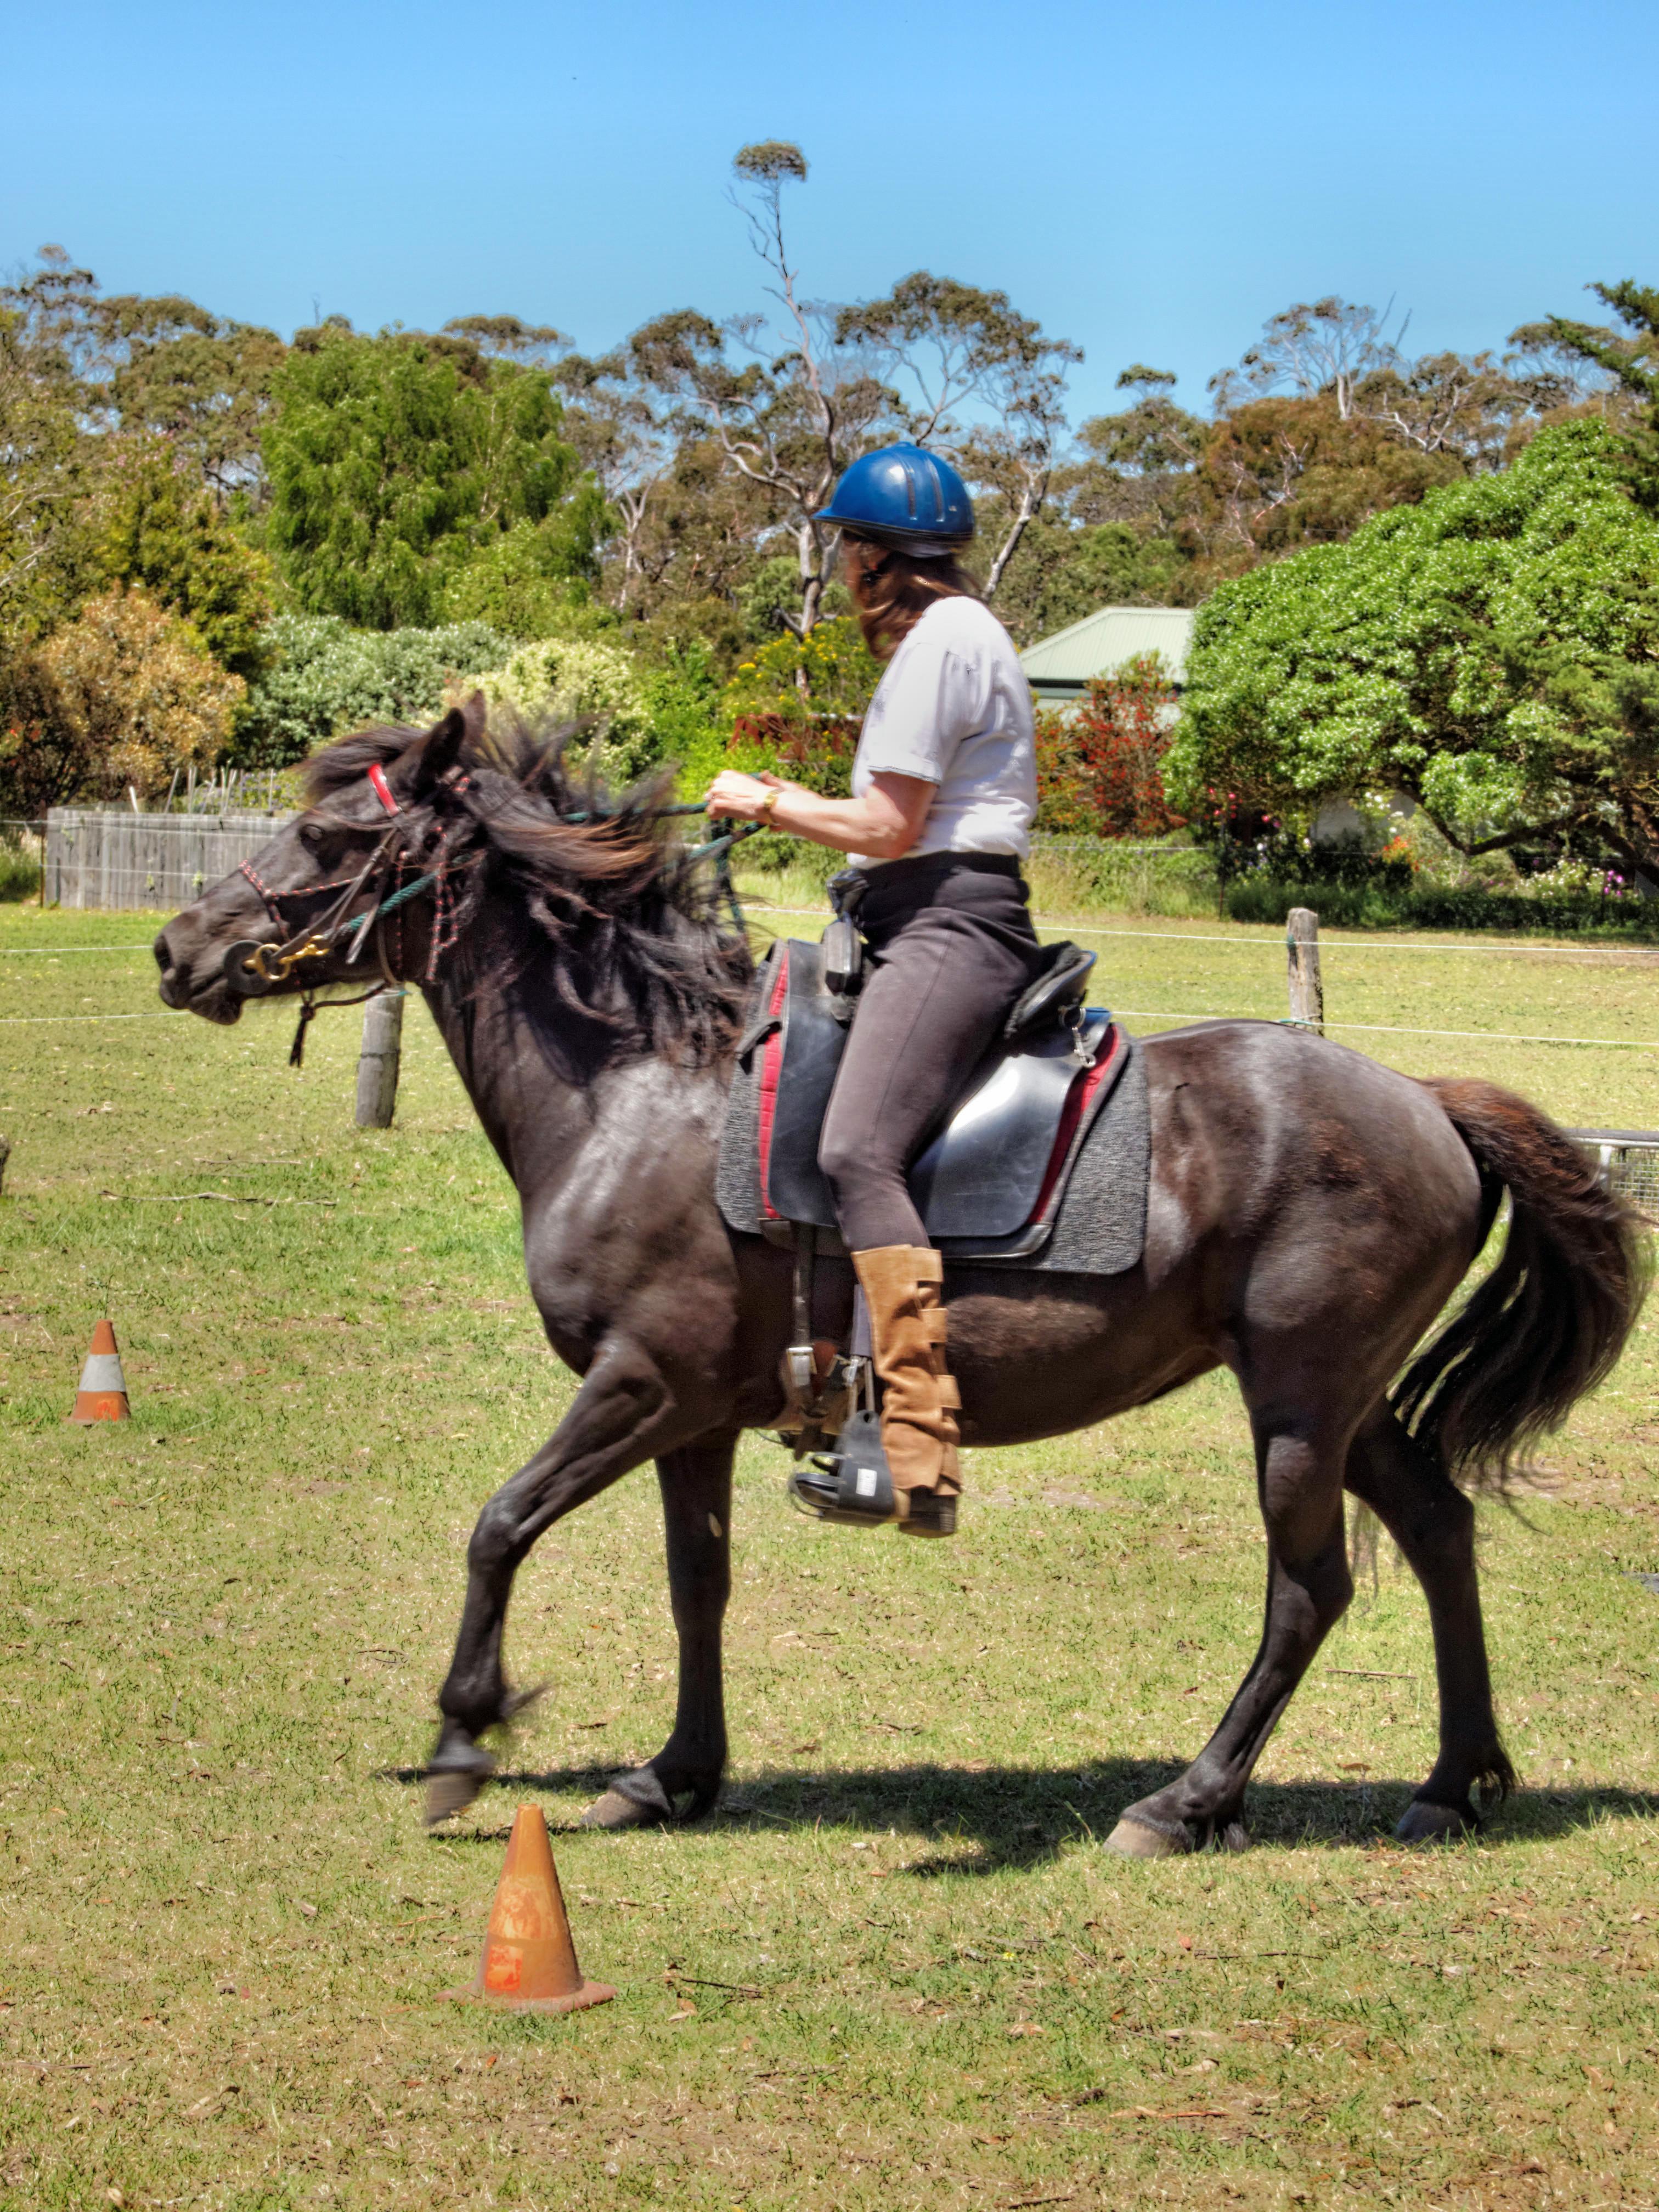 Riding-16.jpeg